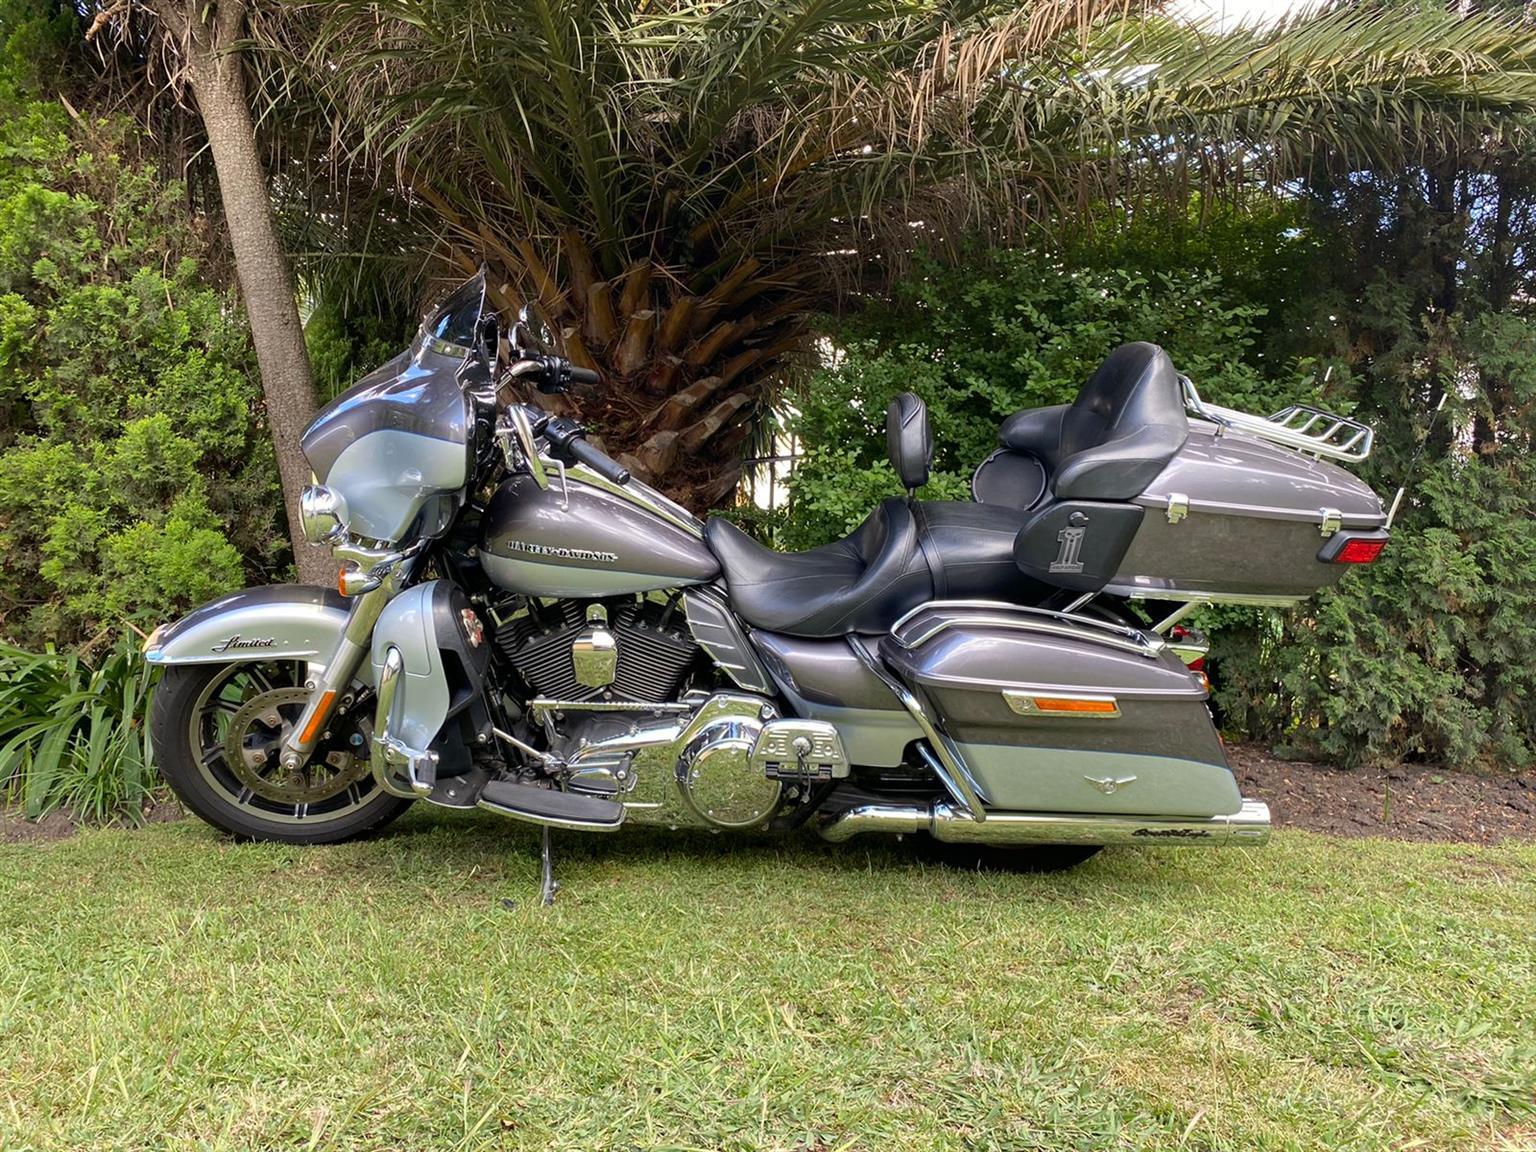 Harley Davidson Ultra limited - 2014